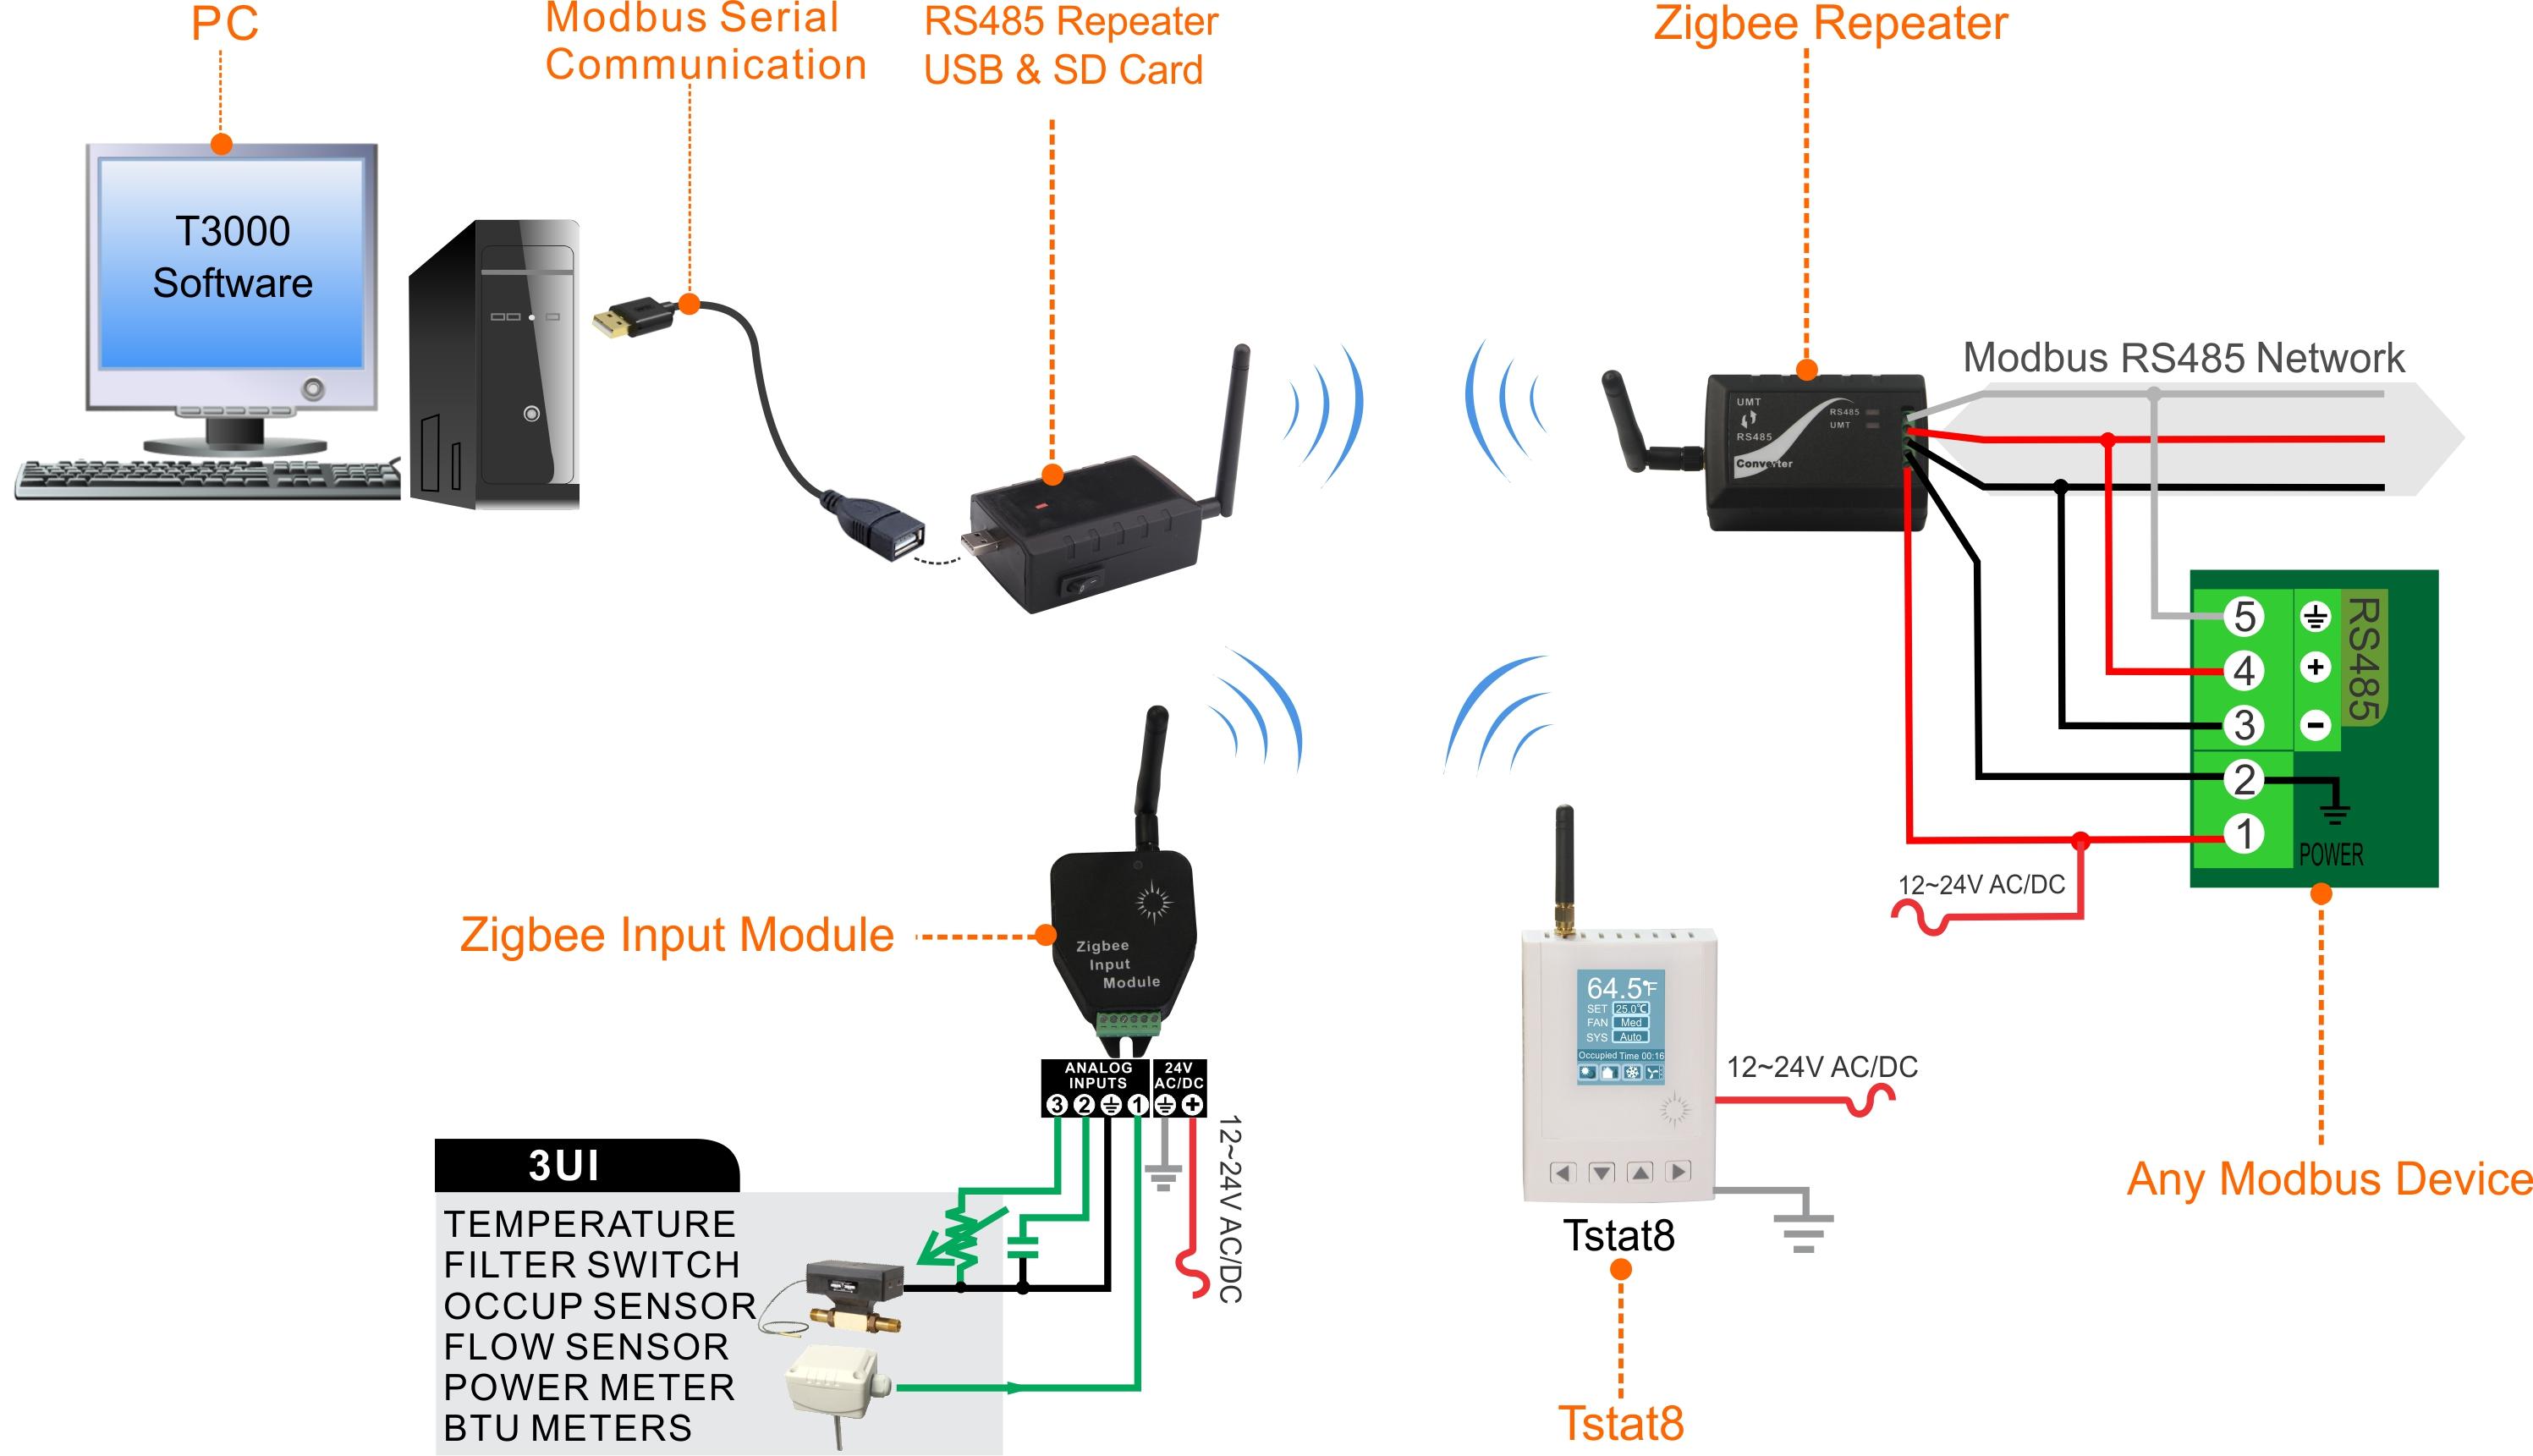 rs485 to usb converter circuit diagram winnebago motorhomes wiring diagrams wireless modbus bravo controls